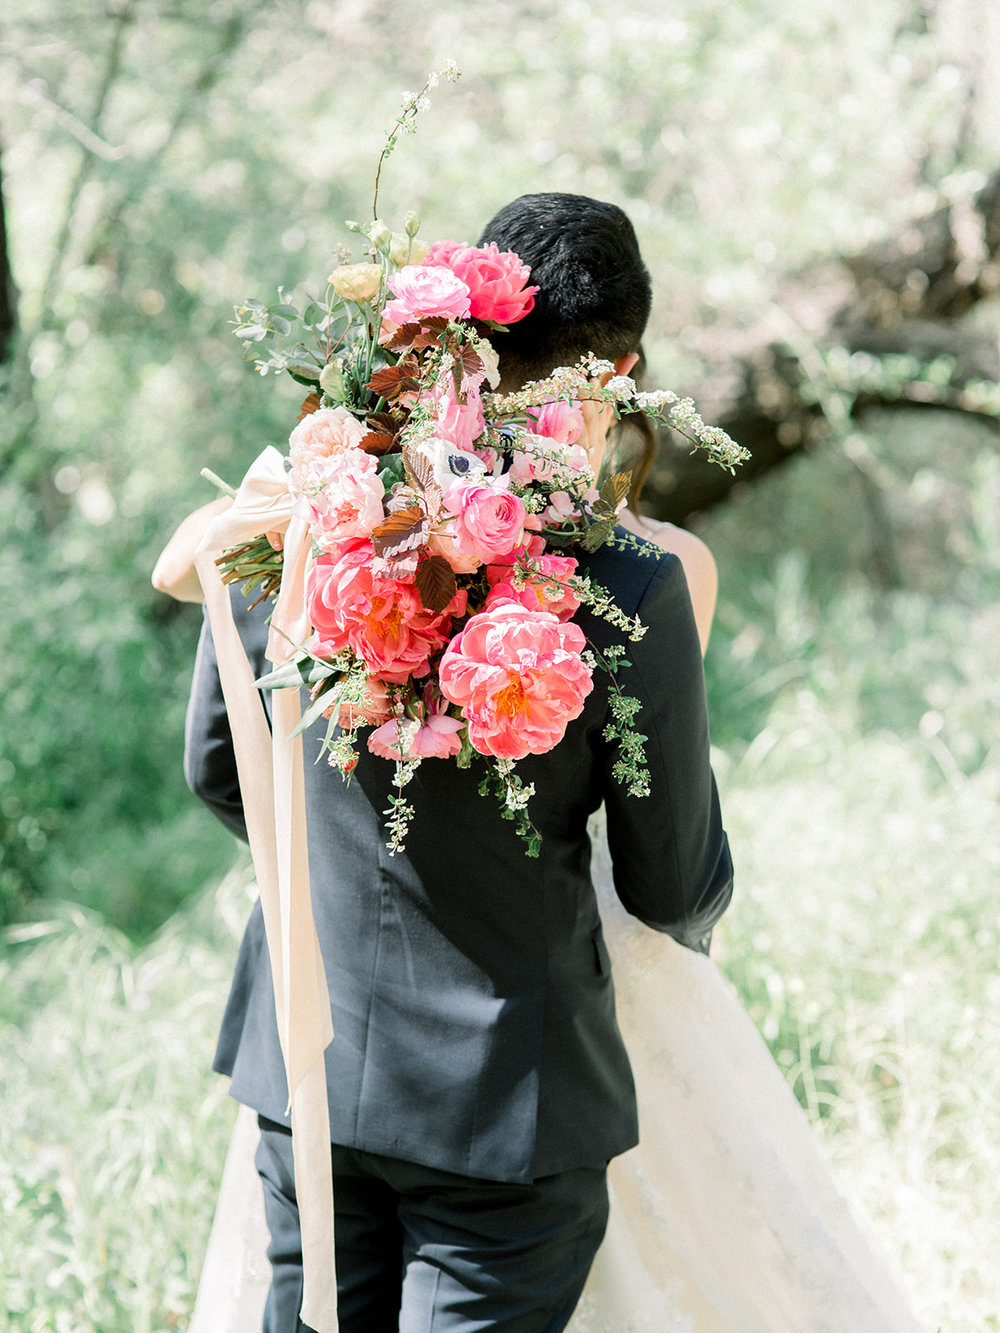 jueunandjon-etherandsmith-wedding-329.jpg